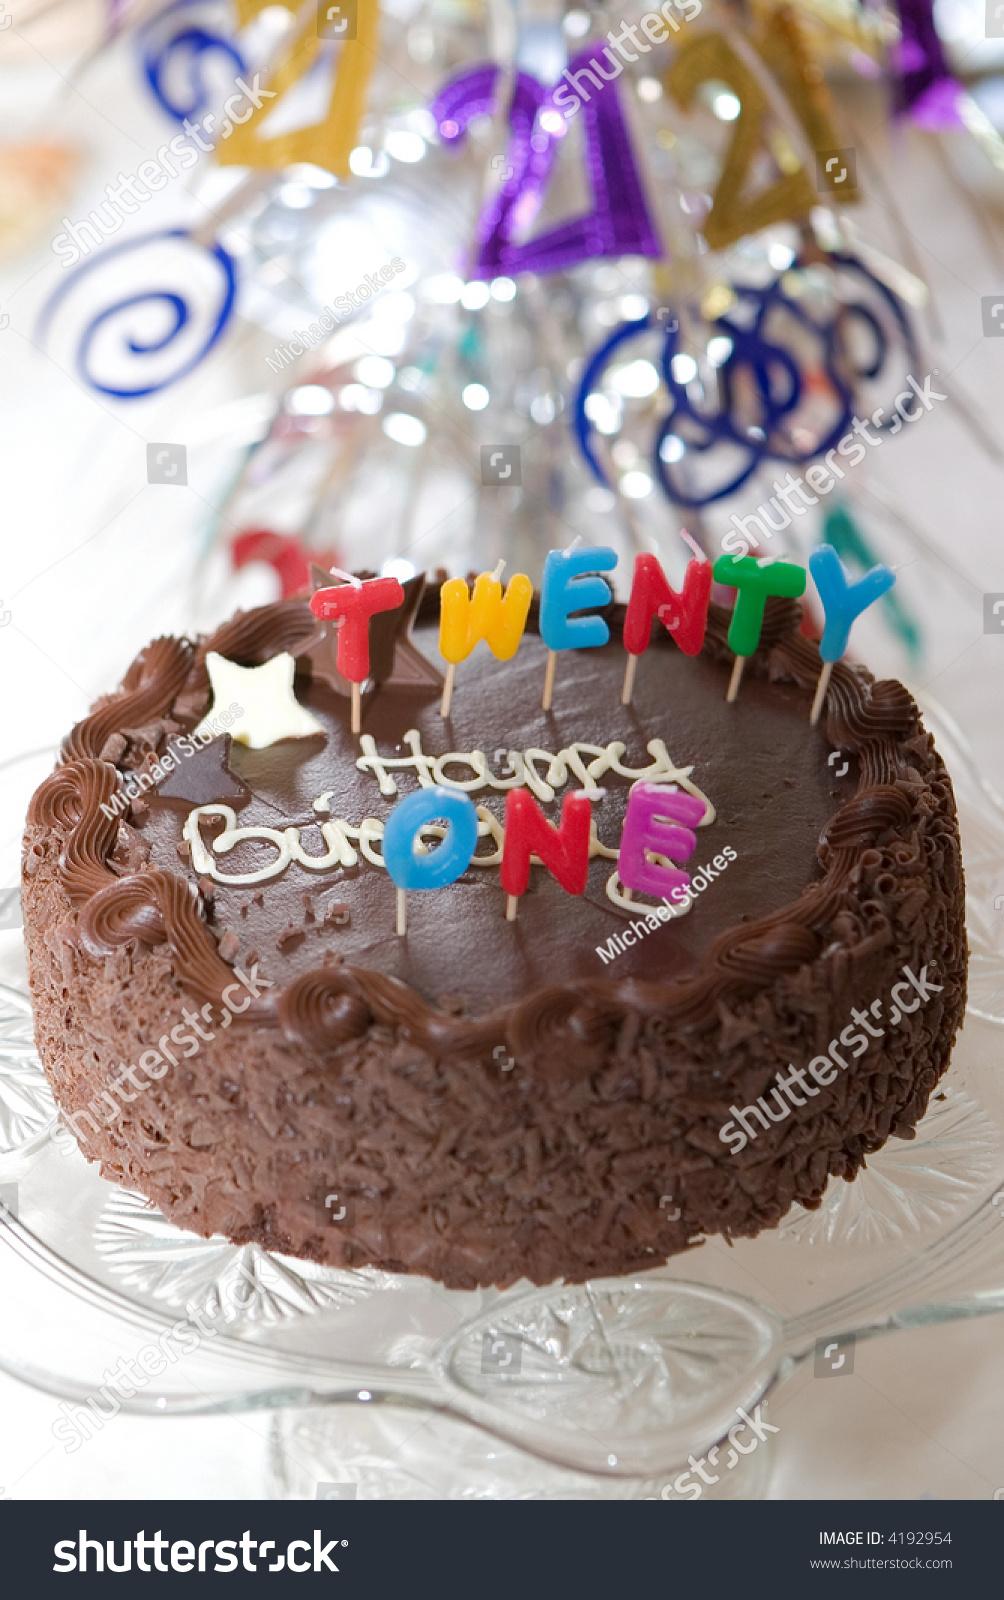 Birthday Cake 21st Birthday Party Table Stock Photo Edit Now